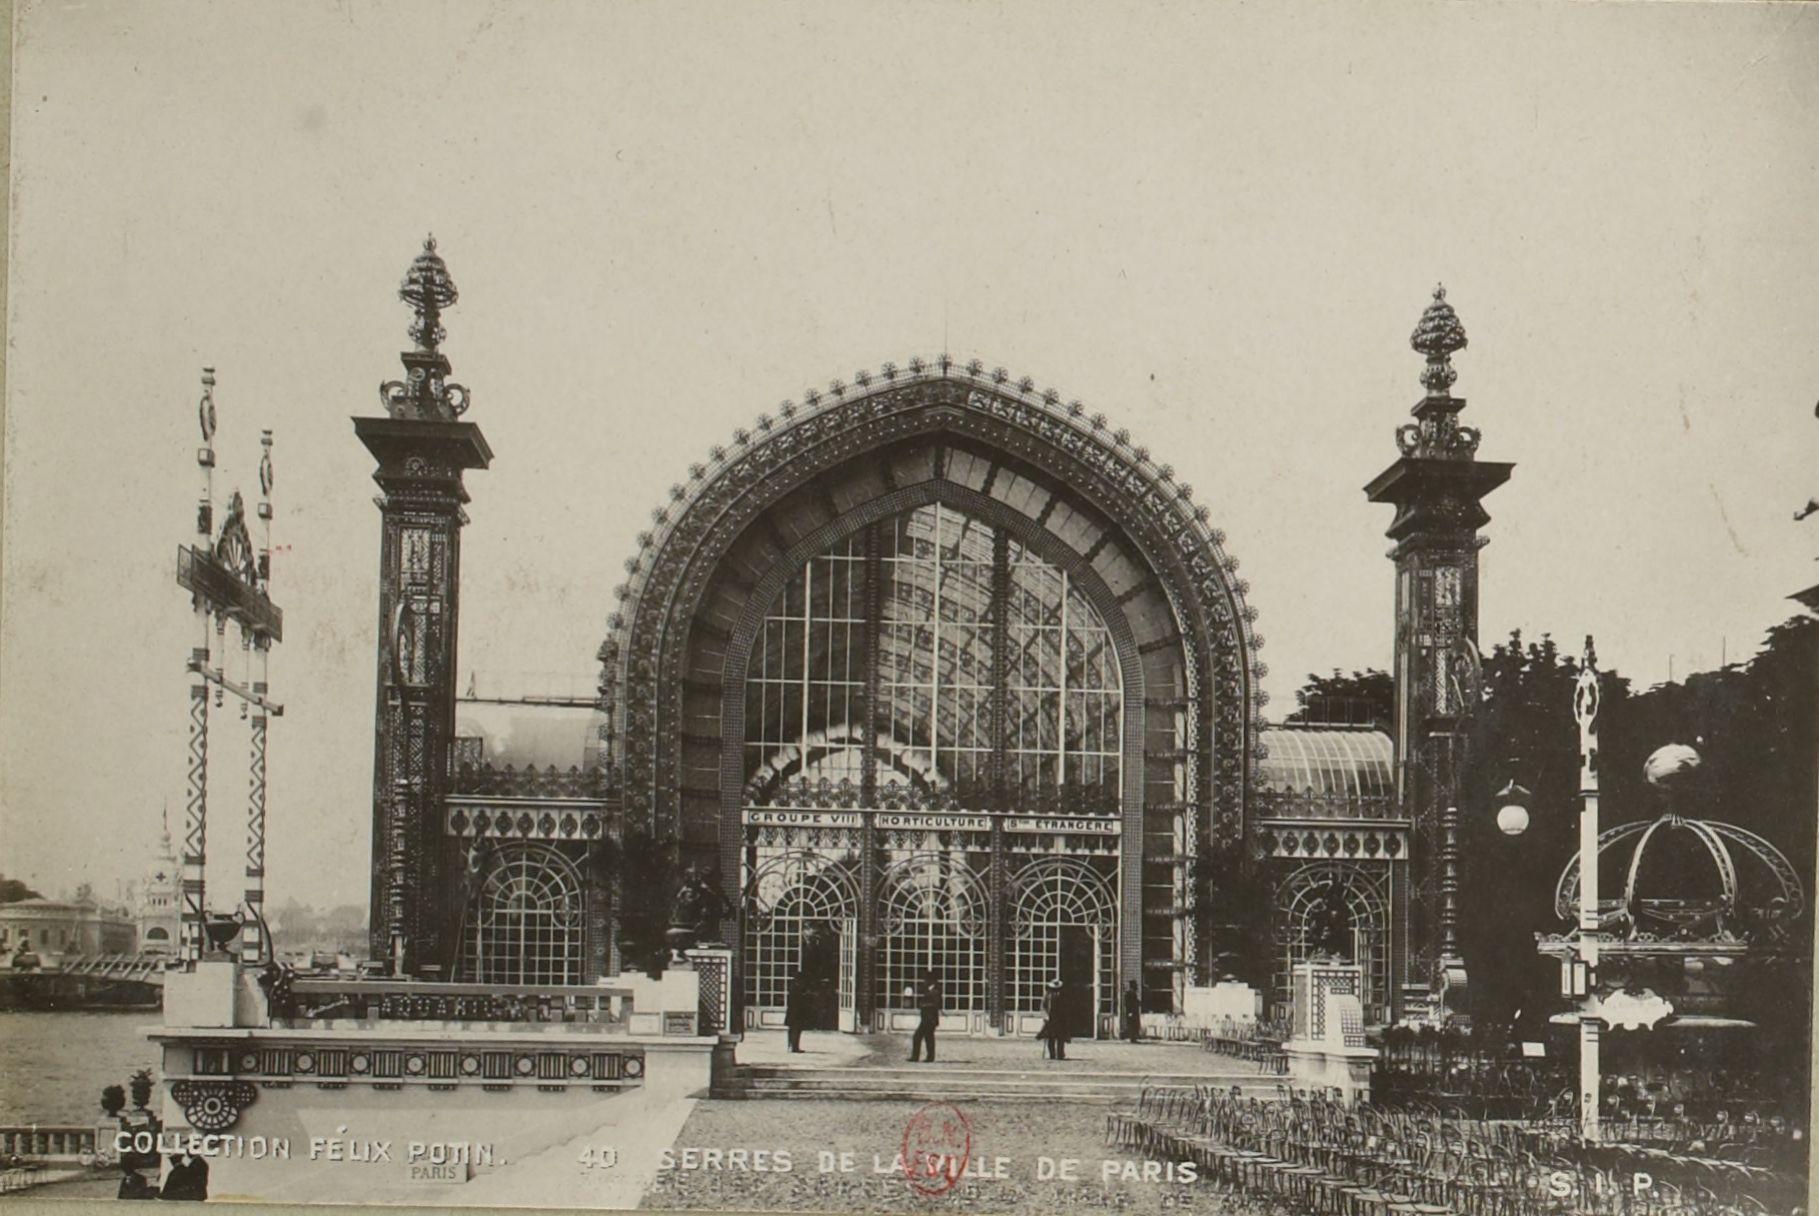 Павильон Парижской мэрии. Вход